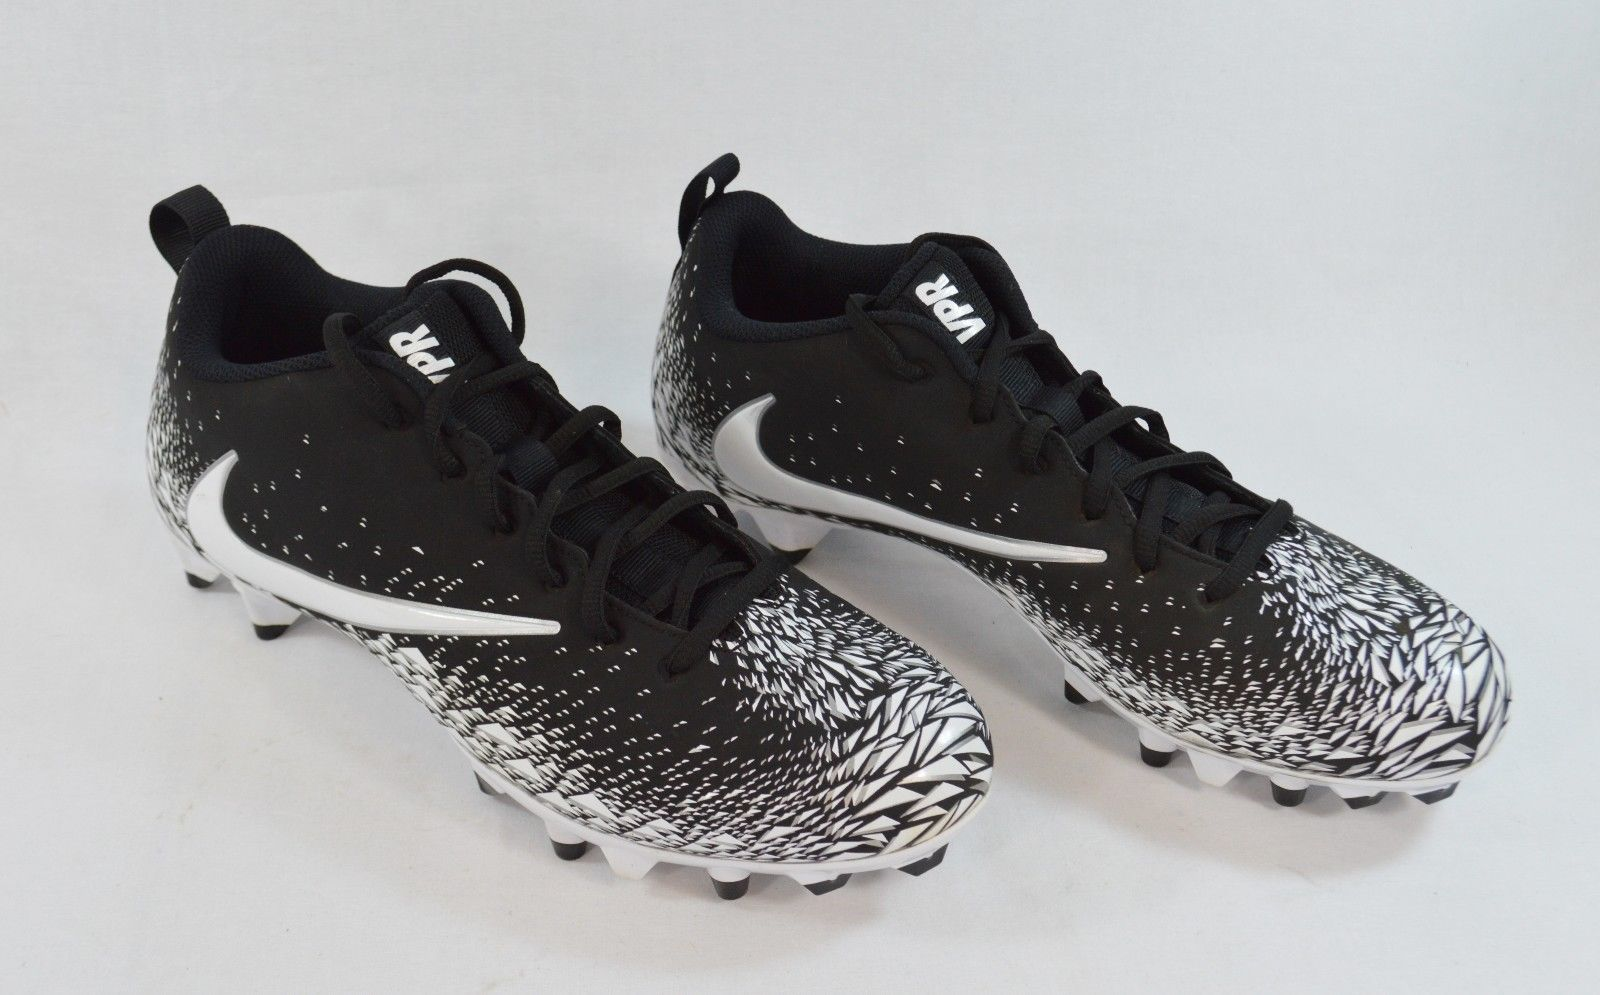 0859bef0690 Nike Vapor Varsity Low TD 880319-010 Black White Football Cleats Men s Size  11